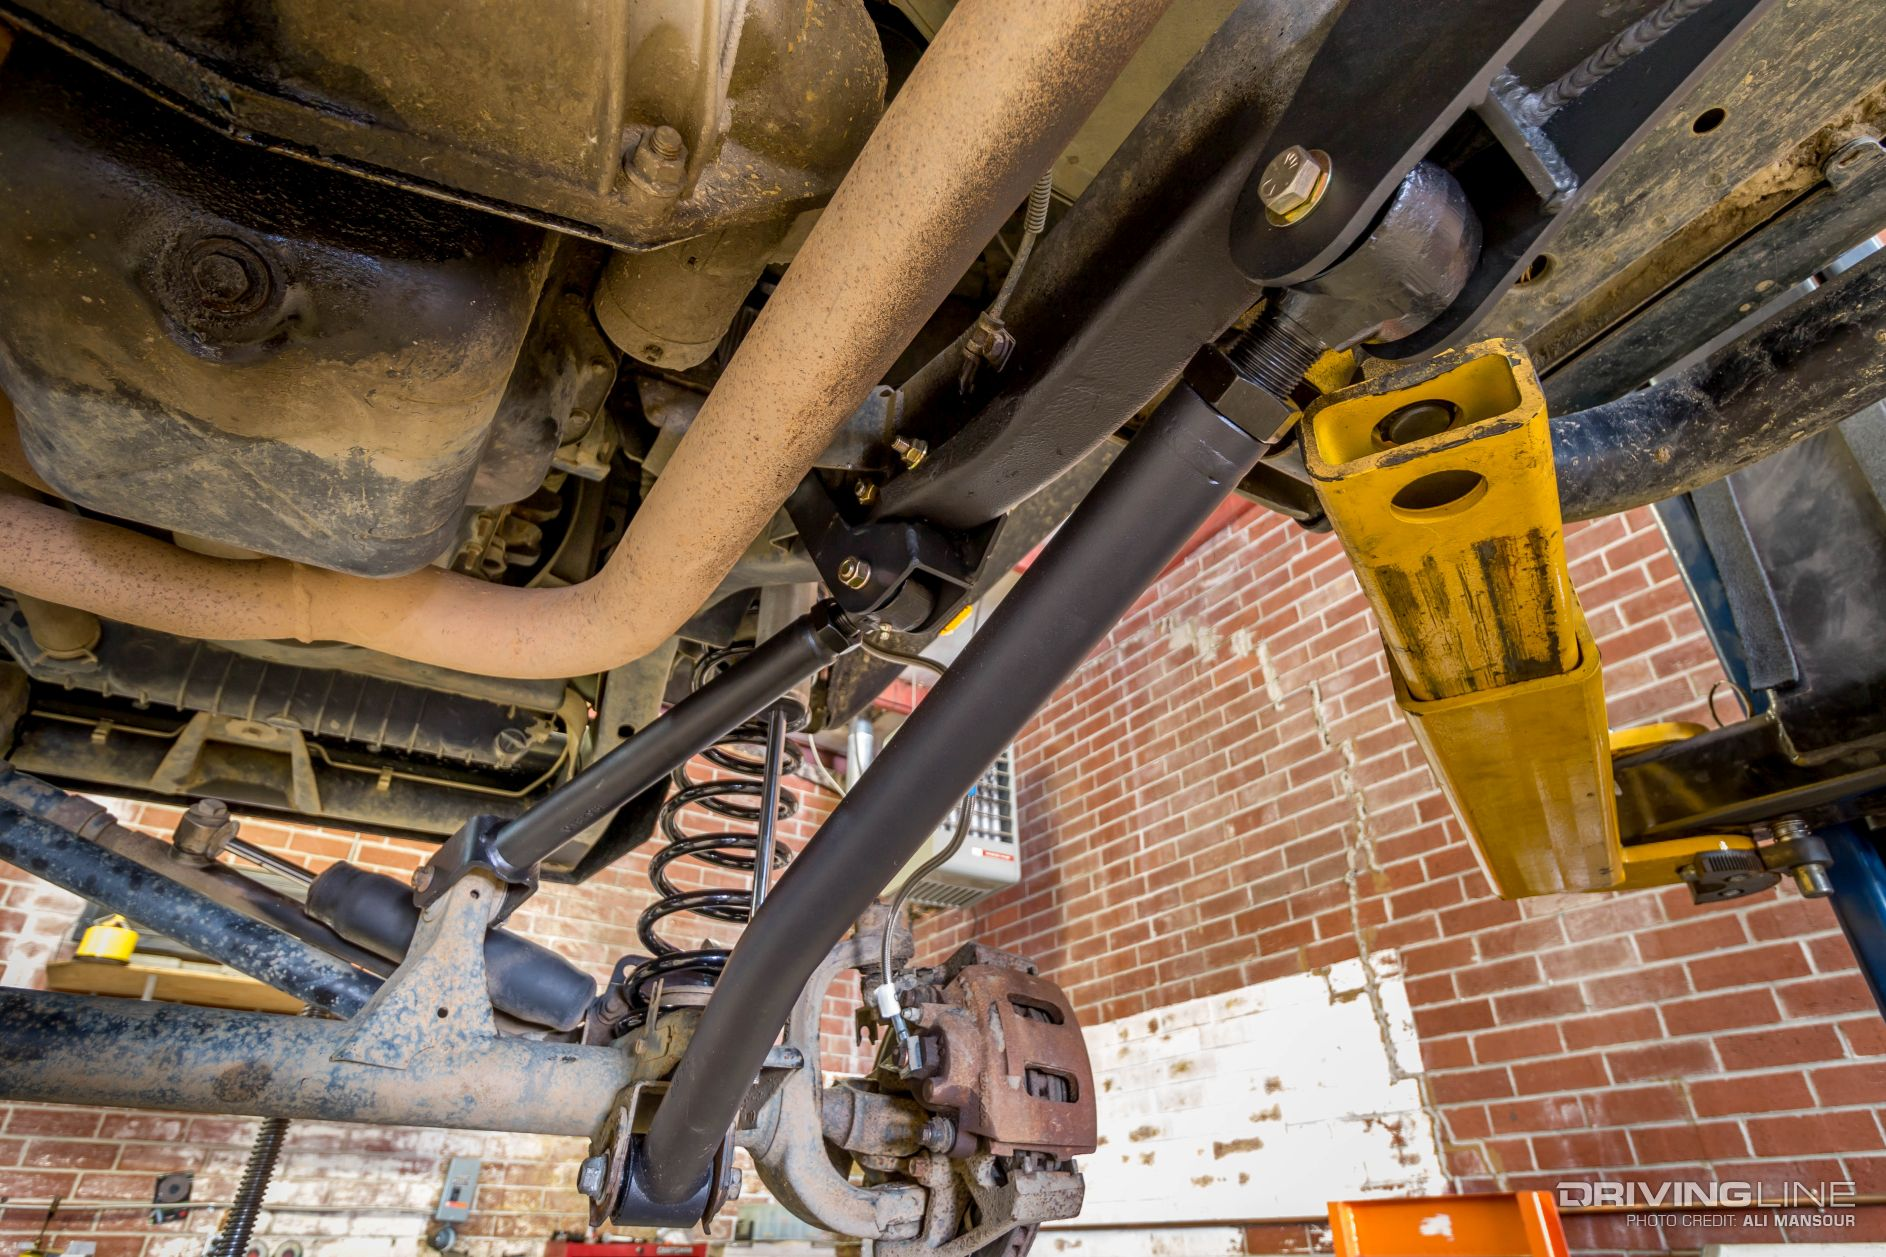 Jeep Tj Parts >> 2000 Jeep Wrangler TJ BDS Long Arm Suspension Install. | DrivingLine